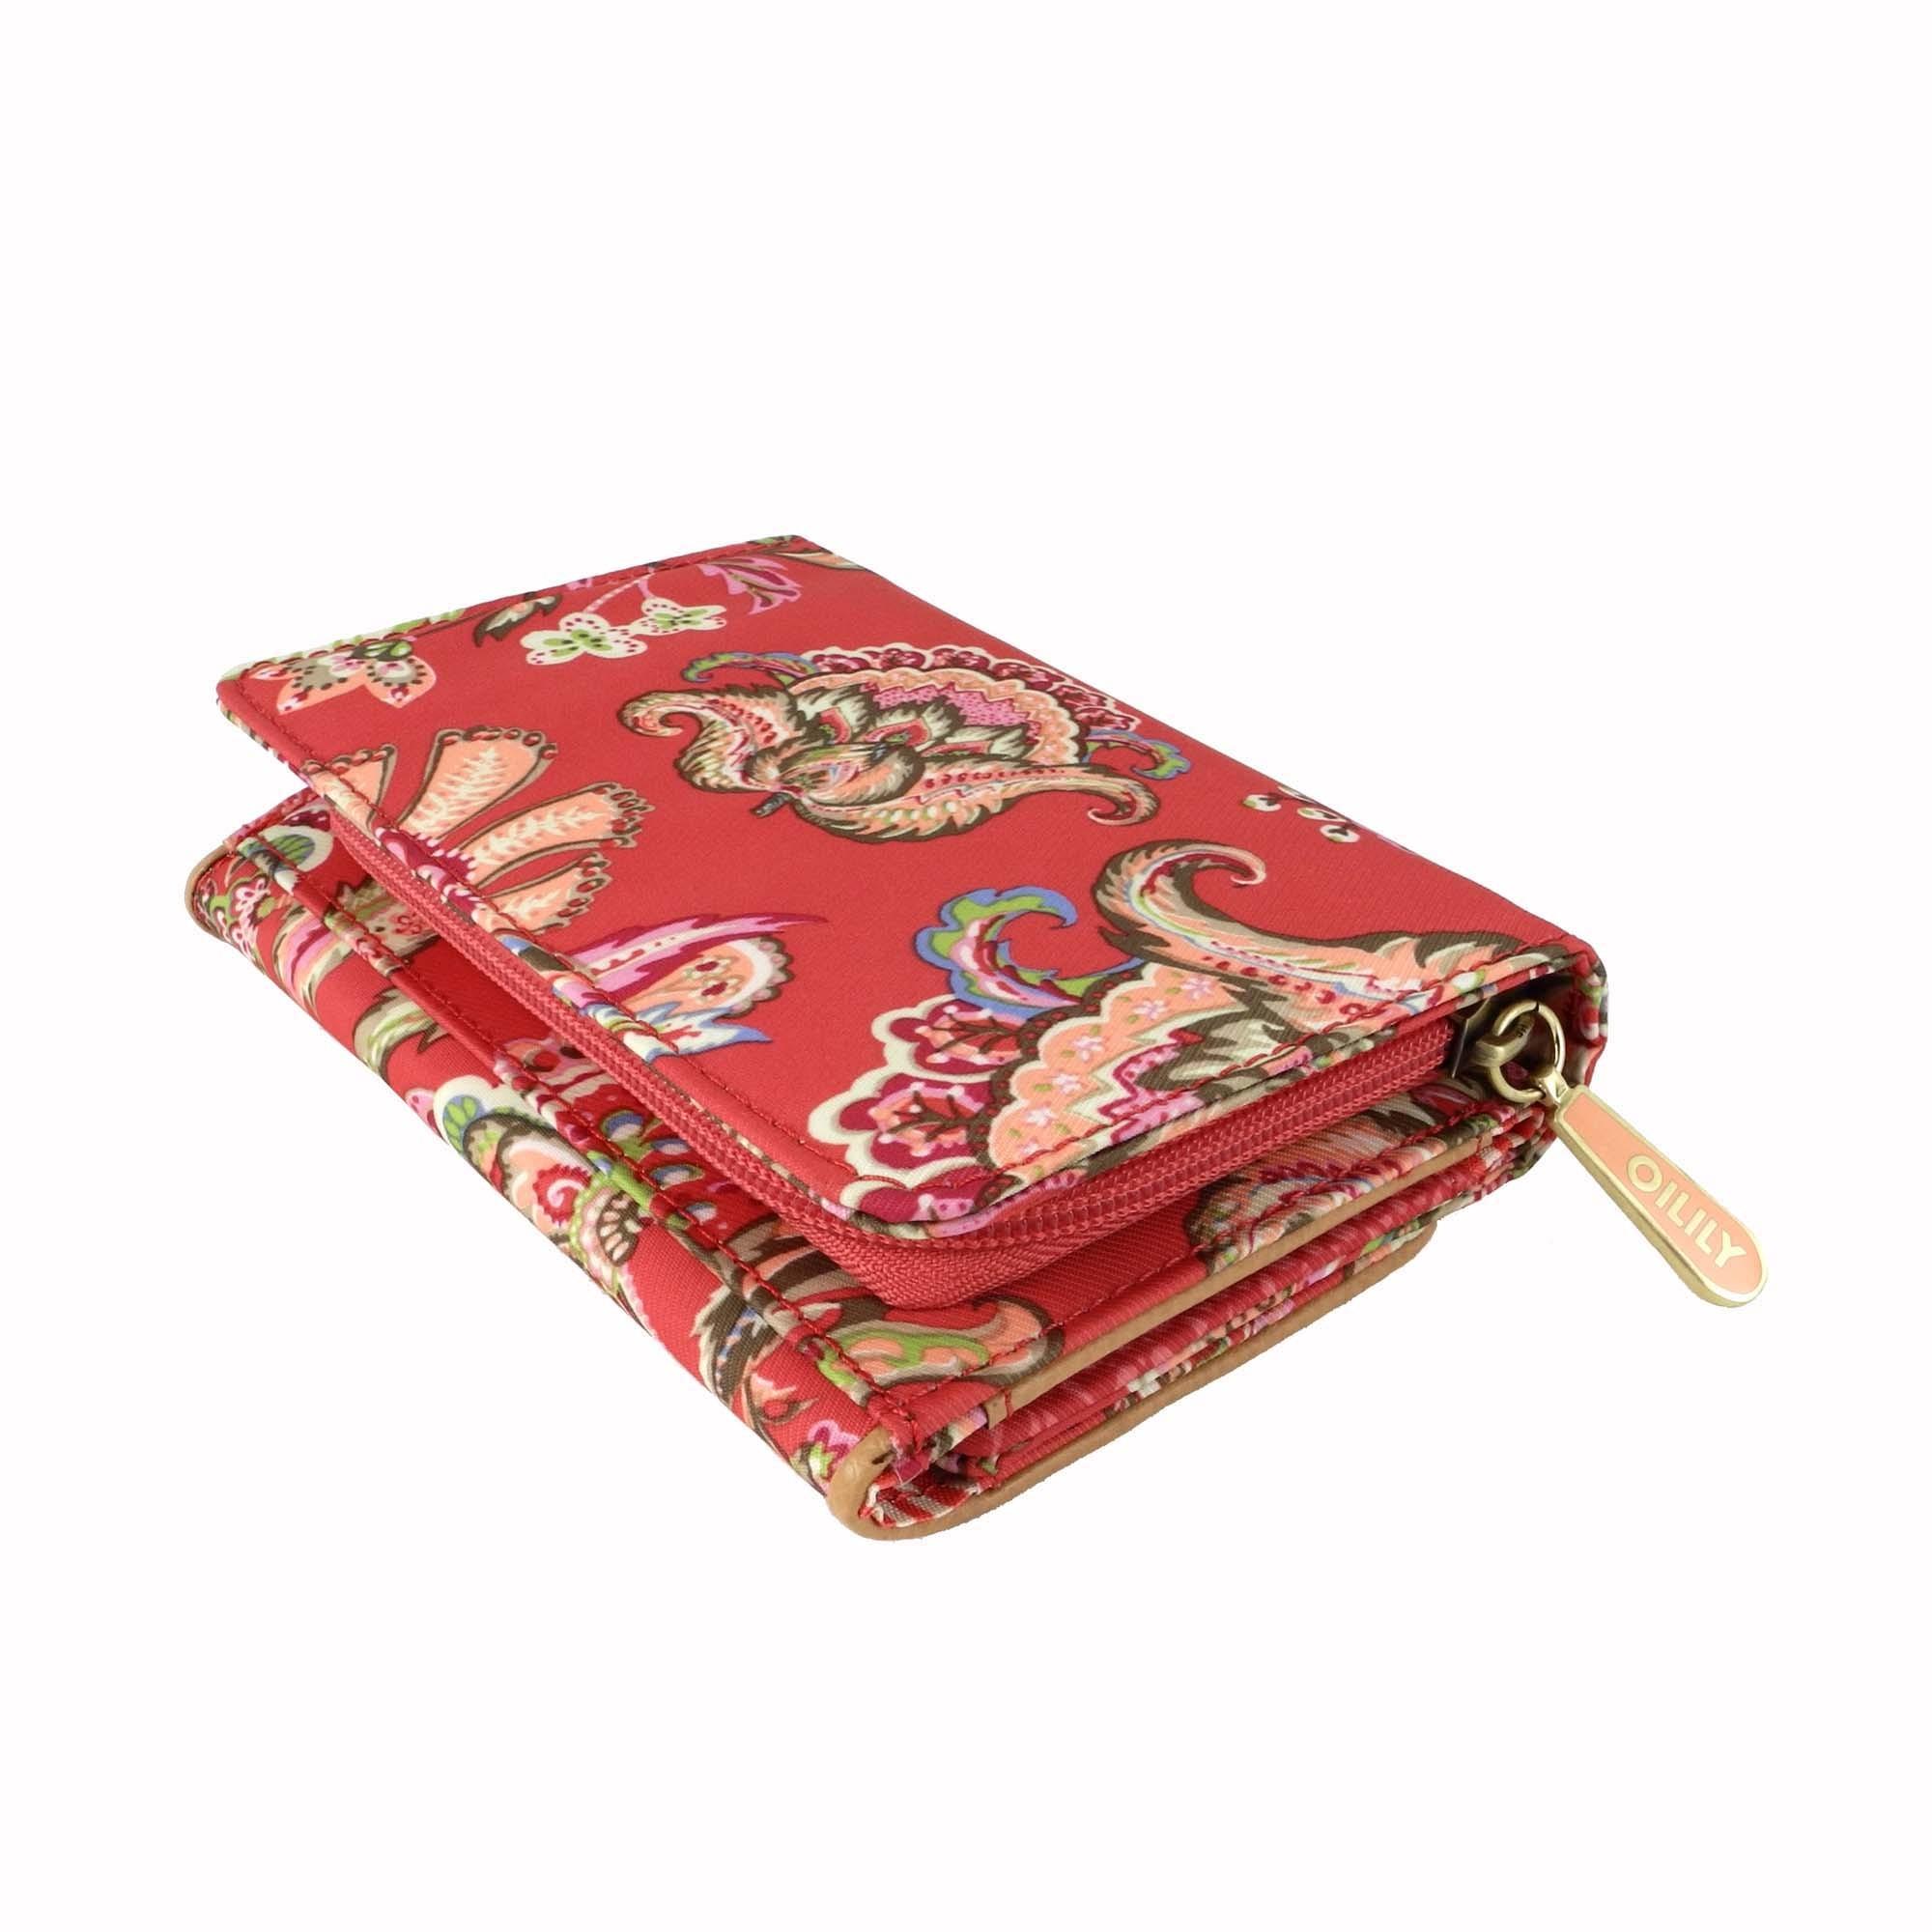 oilily summer flowers geldb rse s wallet portemonnaie rose. Black Bedroom Furniture Sets. Home Design Ideas